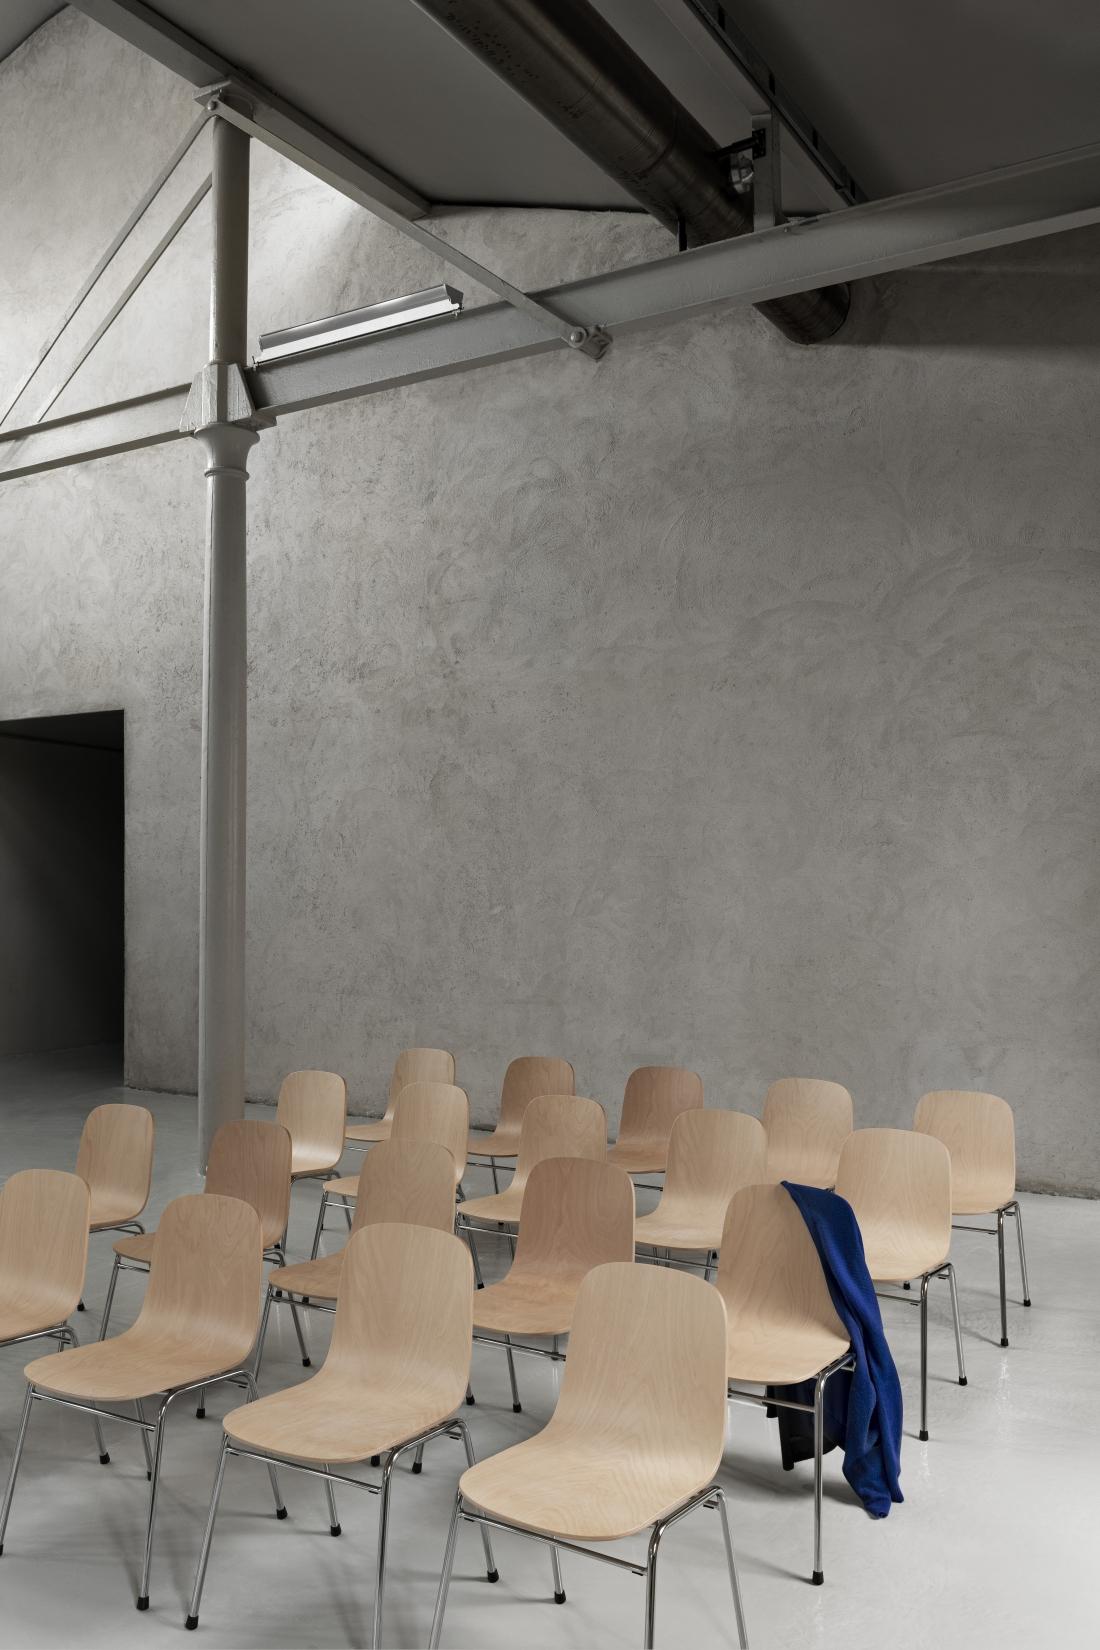 Hem - Touchwood Chair collection designed by Lars Beller Fjetland.